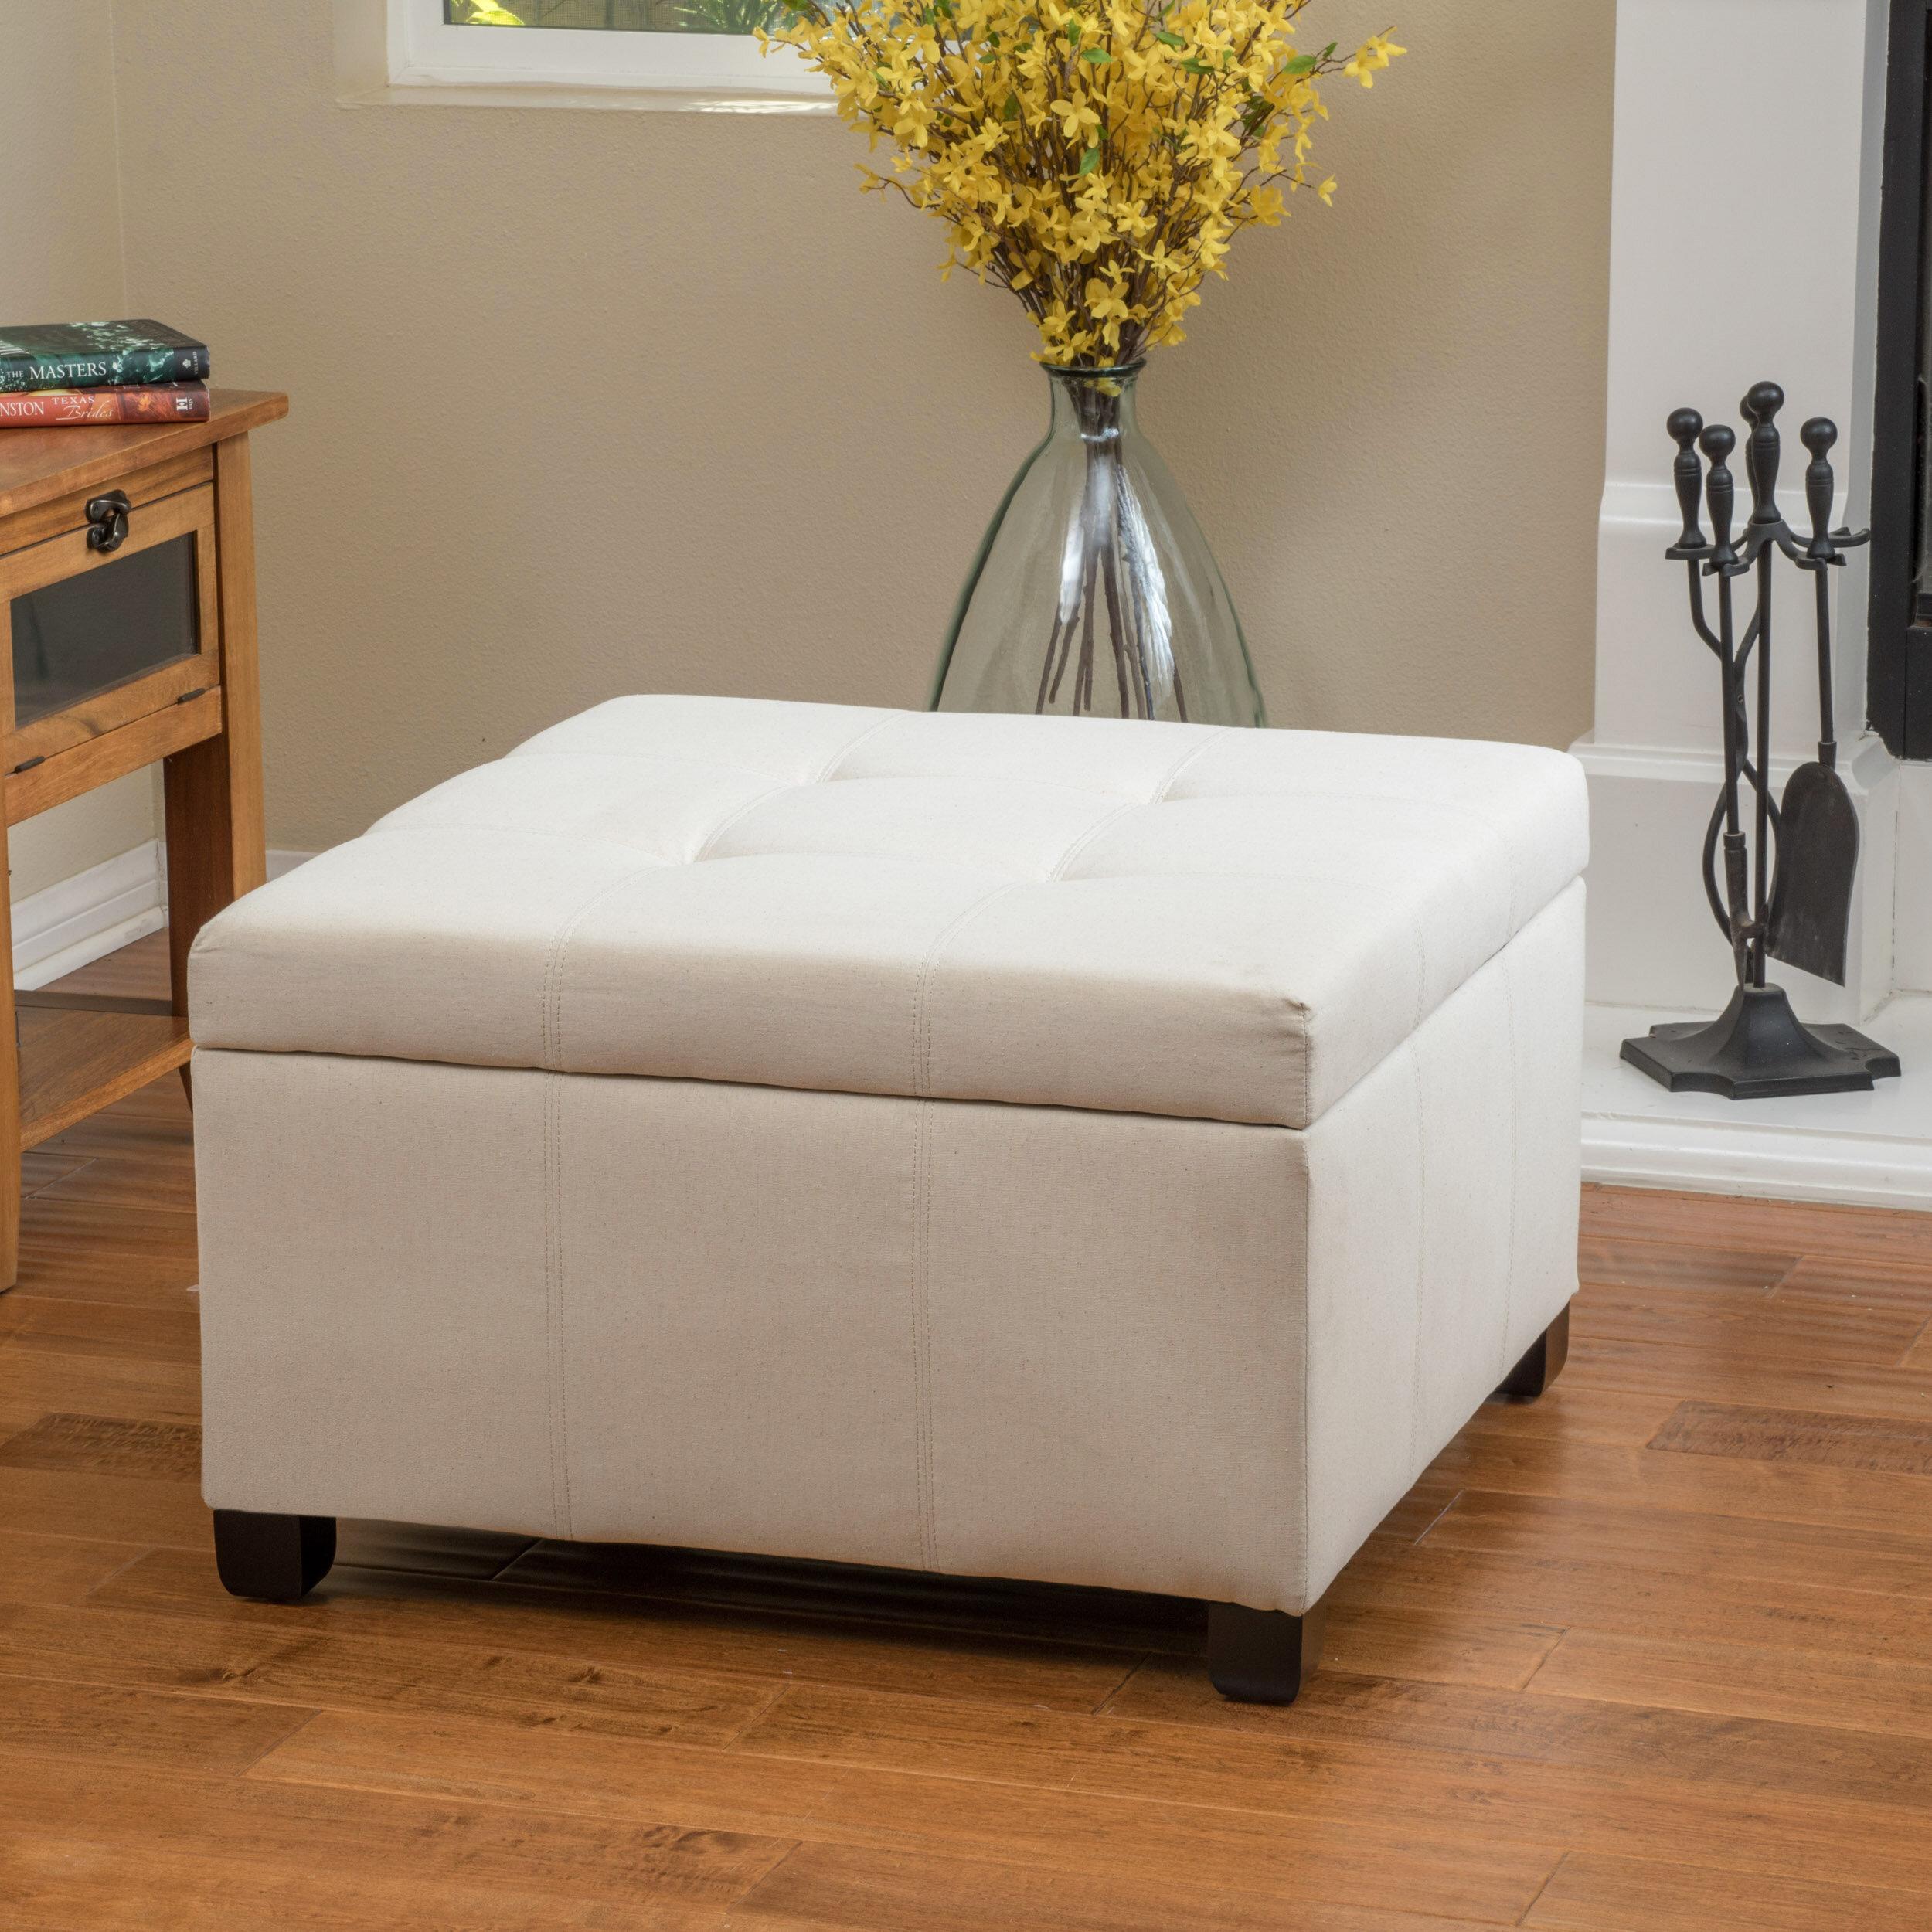 Wondrous Latitude Run Isabeth Hardee Tufted Storage Ottoman Reviews Short Links Chair Design For Home Short Linksinfo